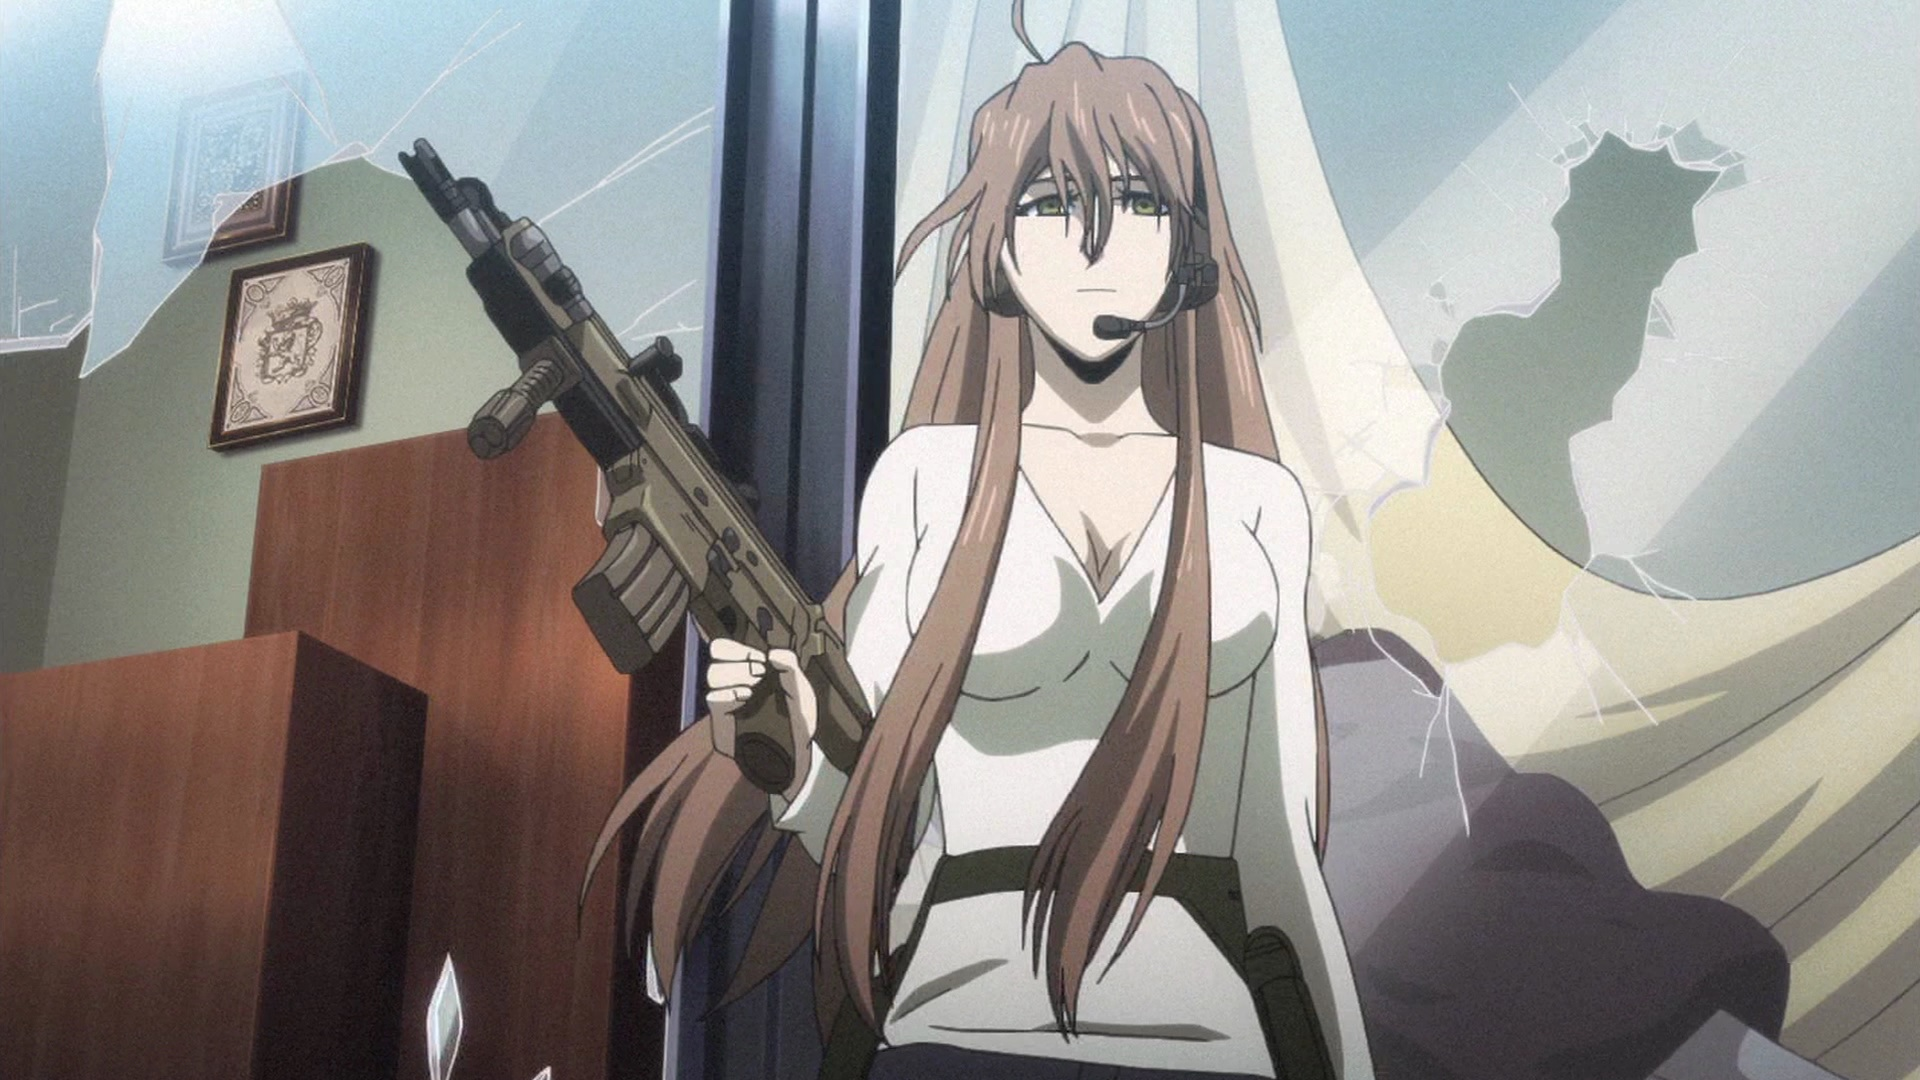 Watch Jormungand Season 2 Episode 15 Sub & Dub | Anime Uncut